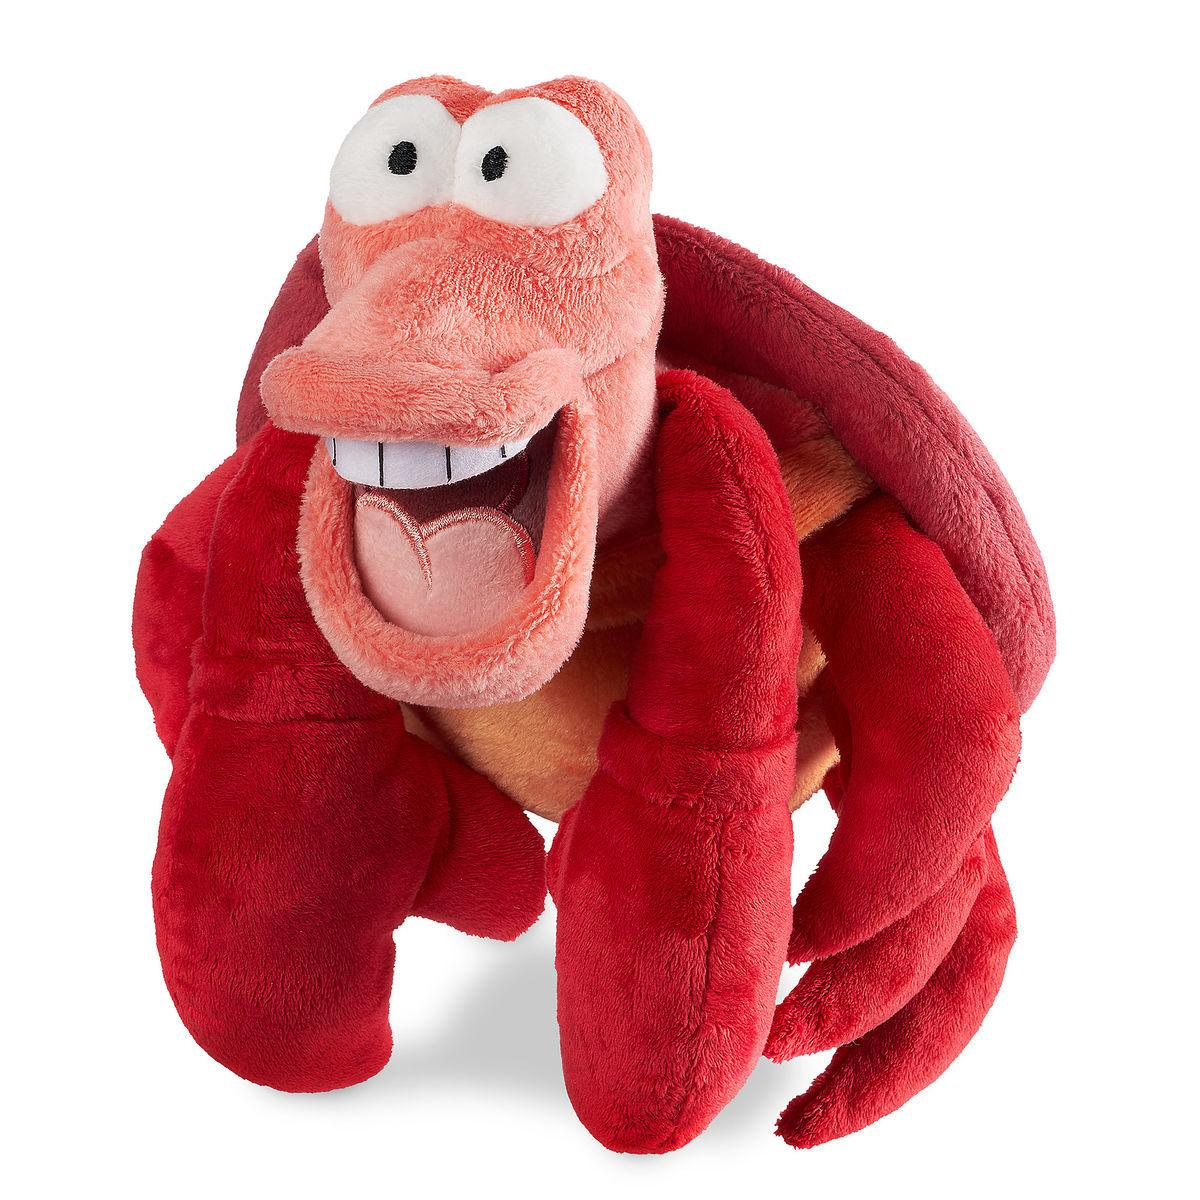 Disney Мягкая игрушка краб Себастьян 18см - Русалочка